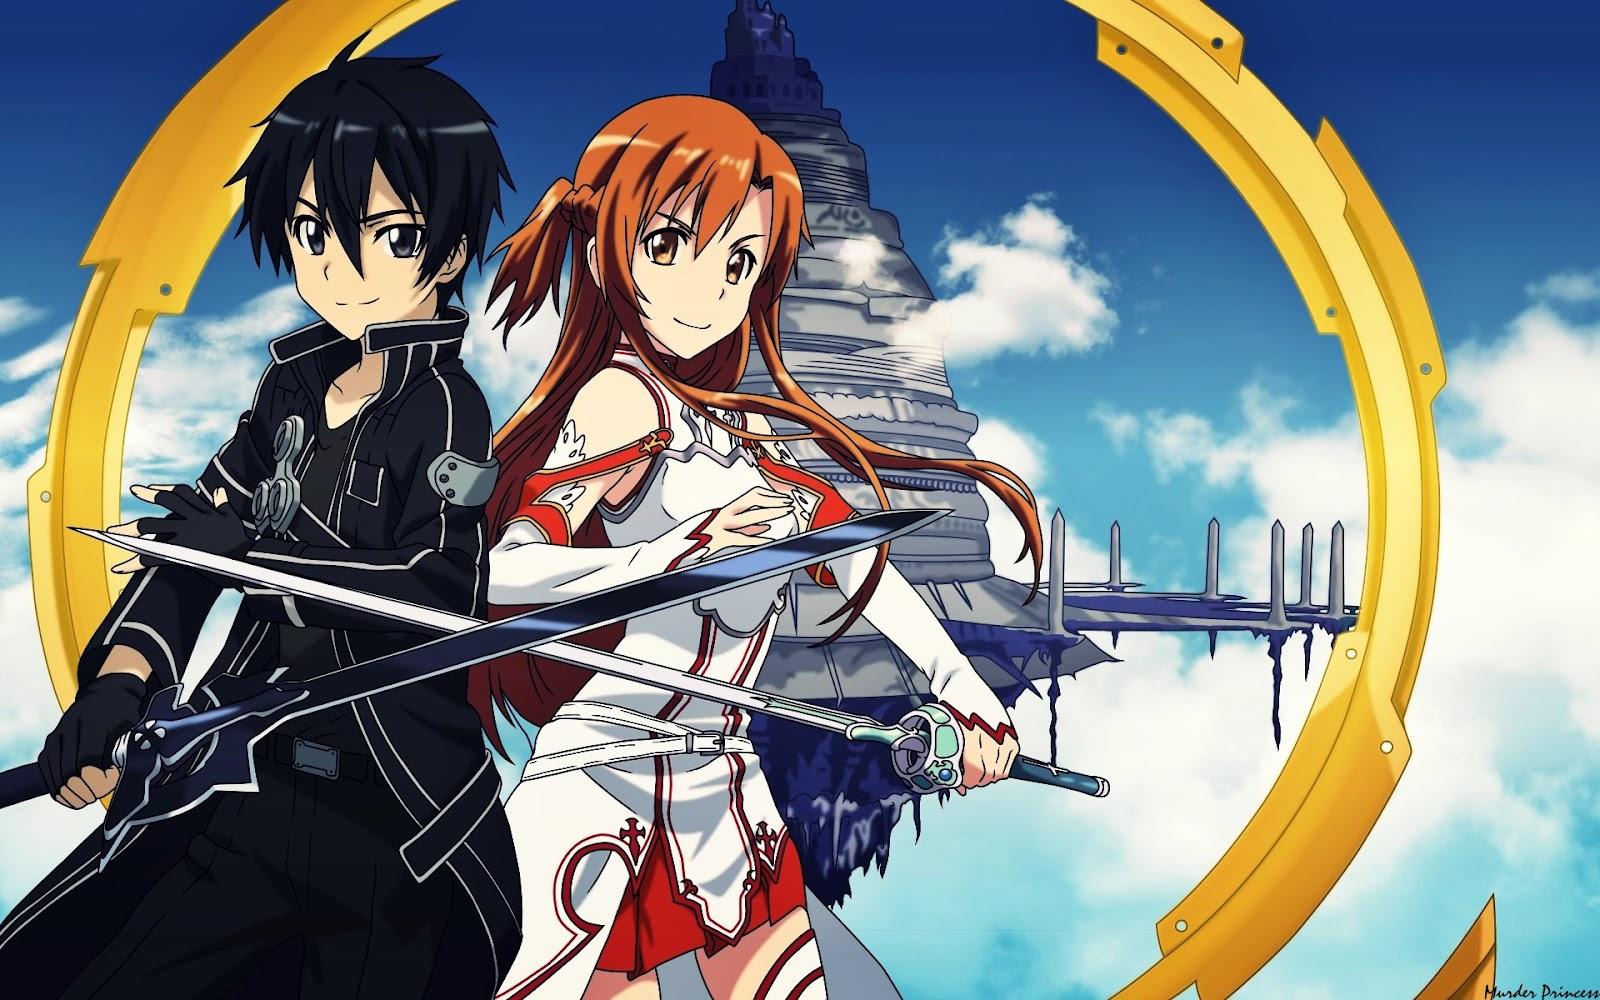 Sword Art Online será adaptado a acción real por Netflix